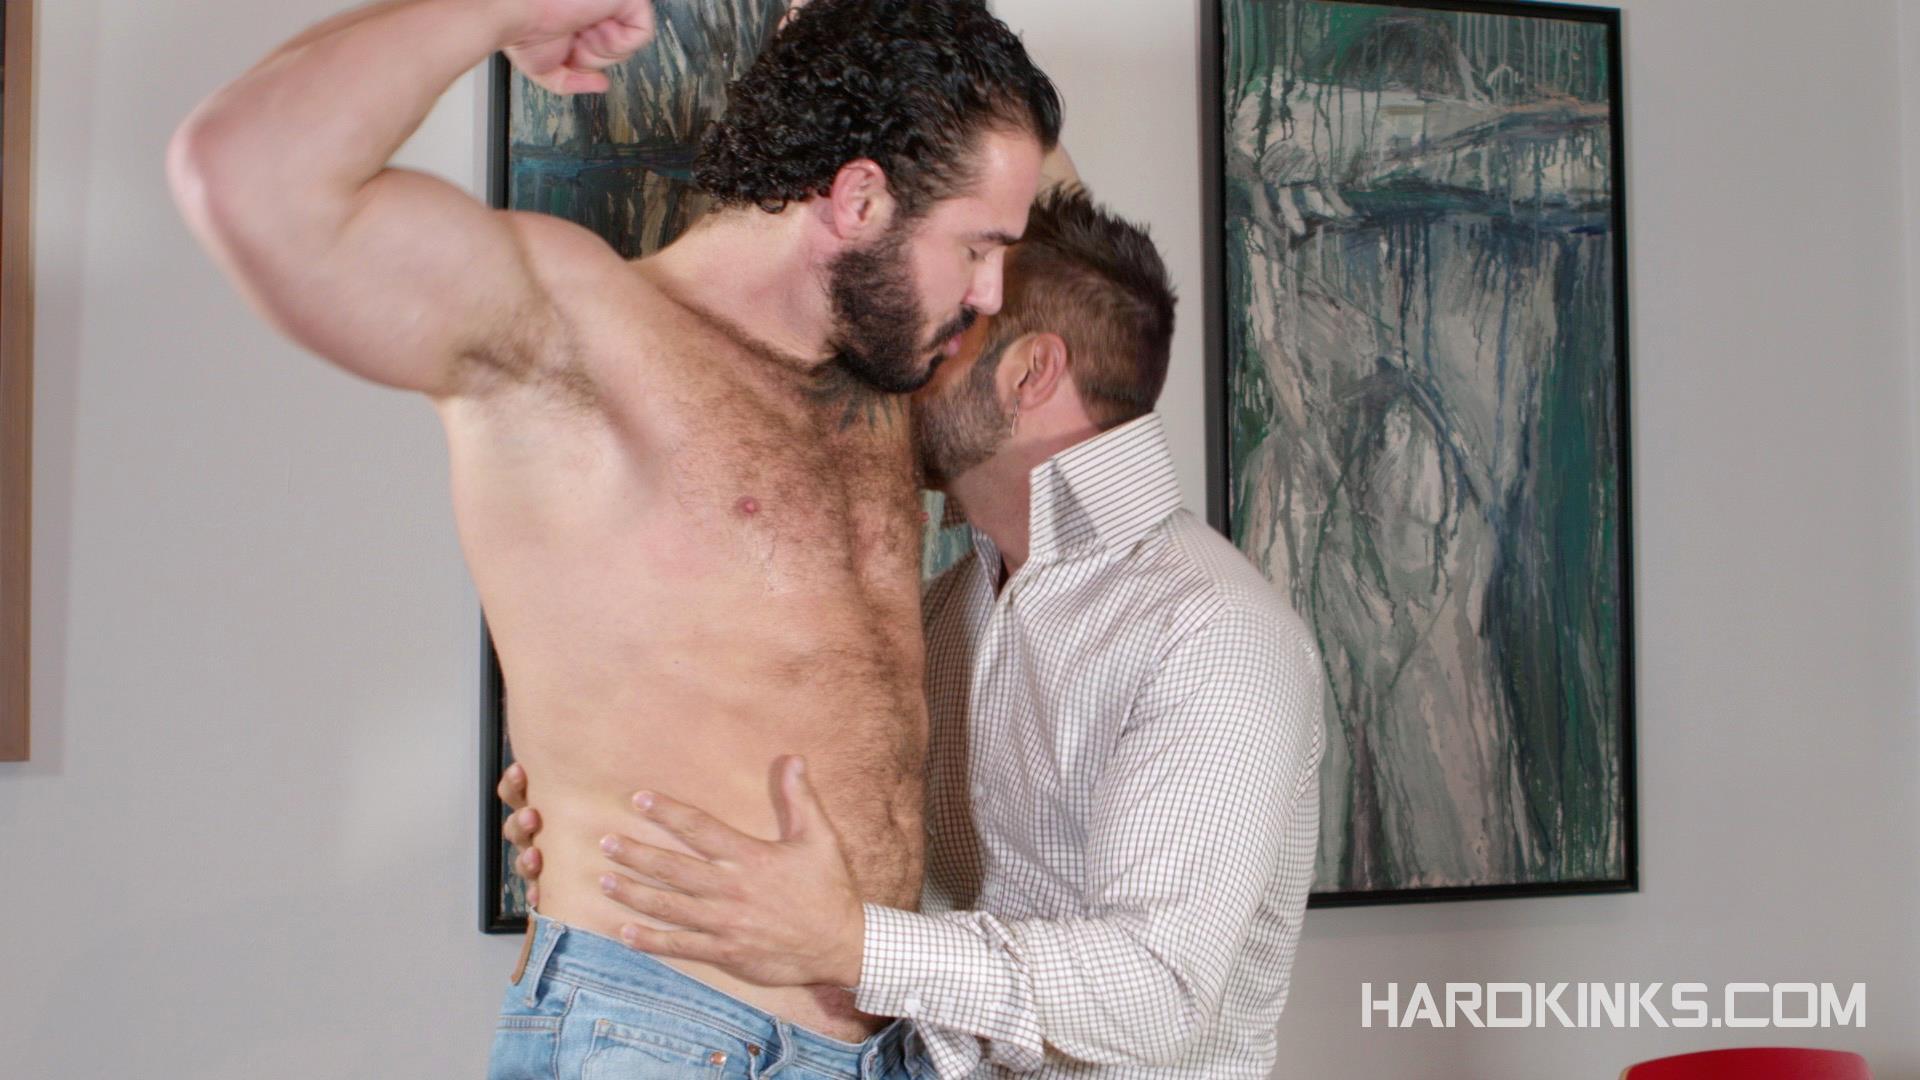 Male hypnosis porn